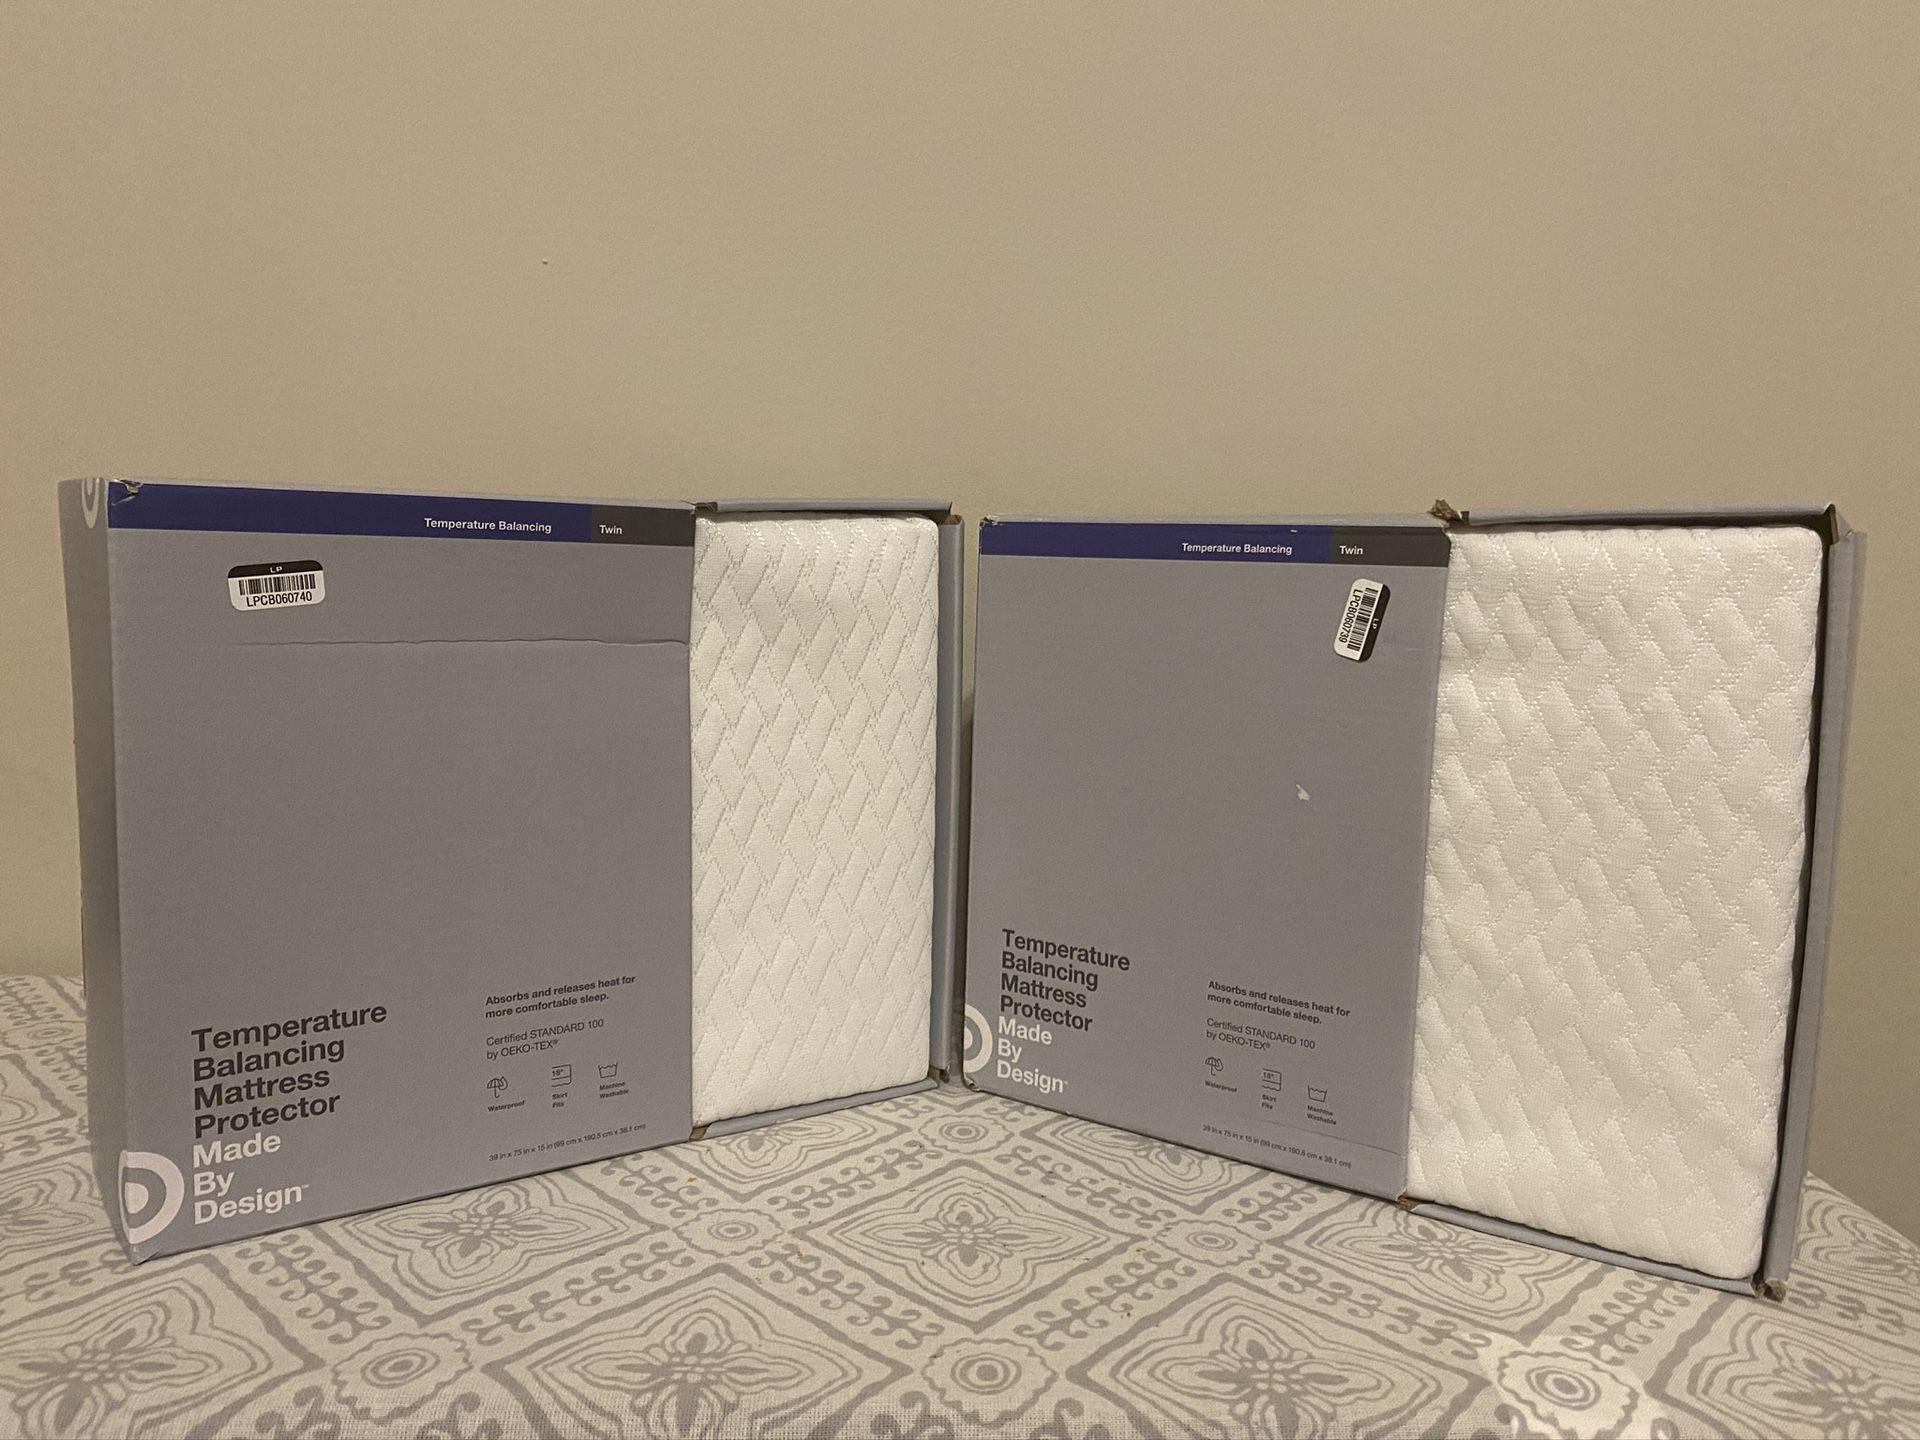 Temperature Balancing Mattress Protector